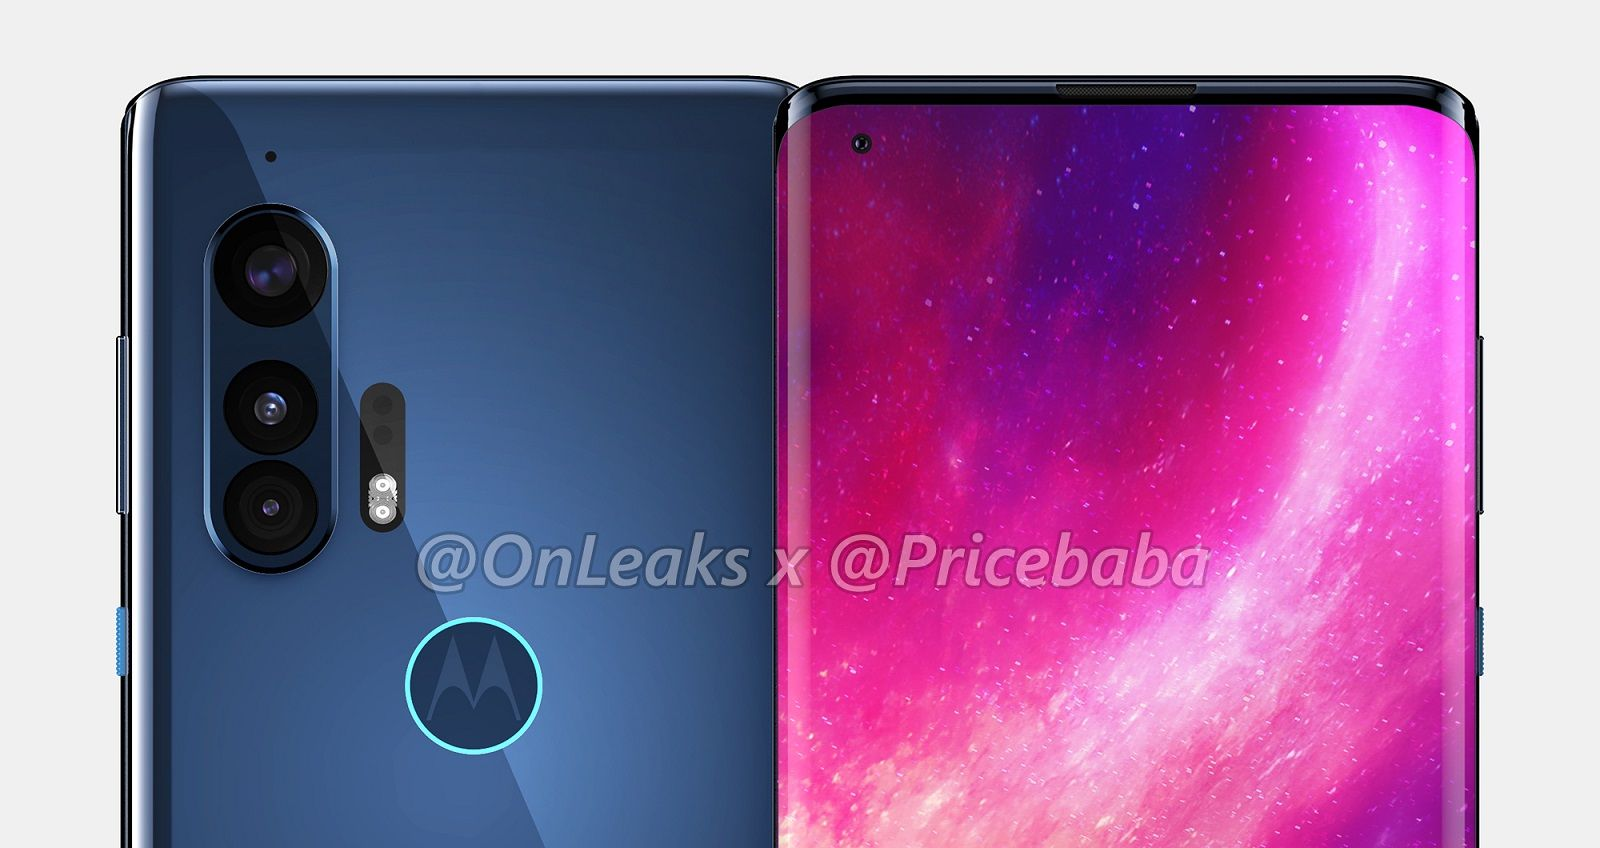 Motorola Edge Plus renders reveal premium 'waterfall' display and triple cameras